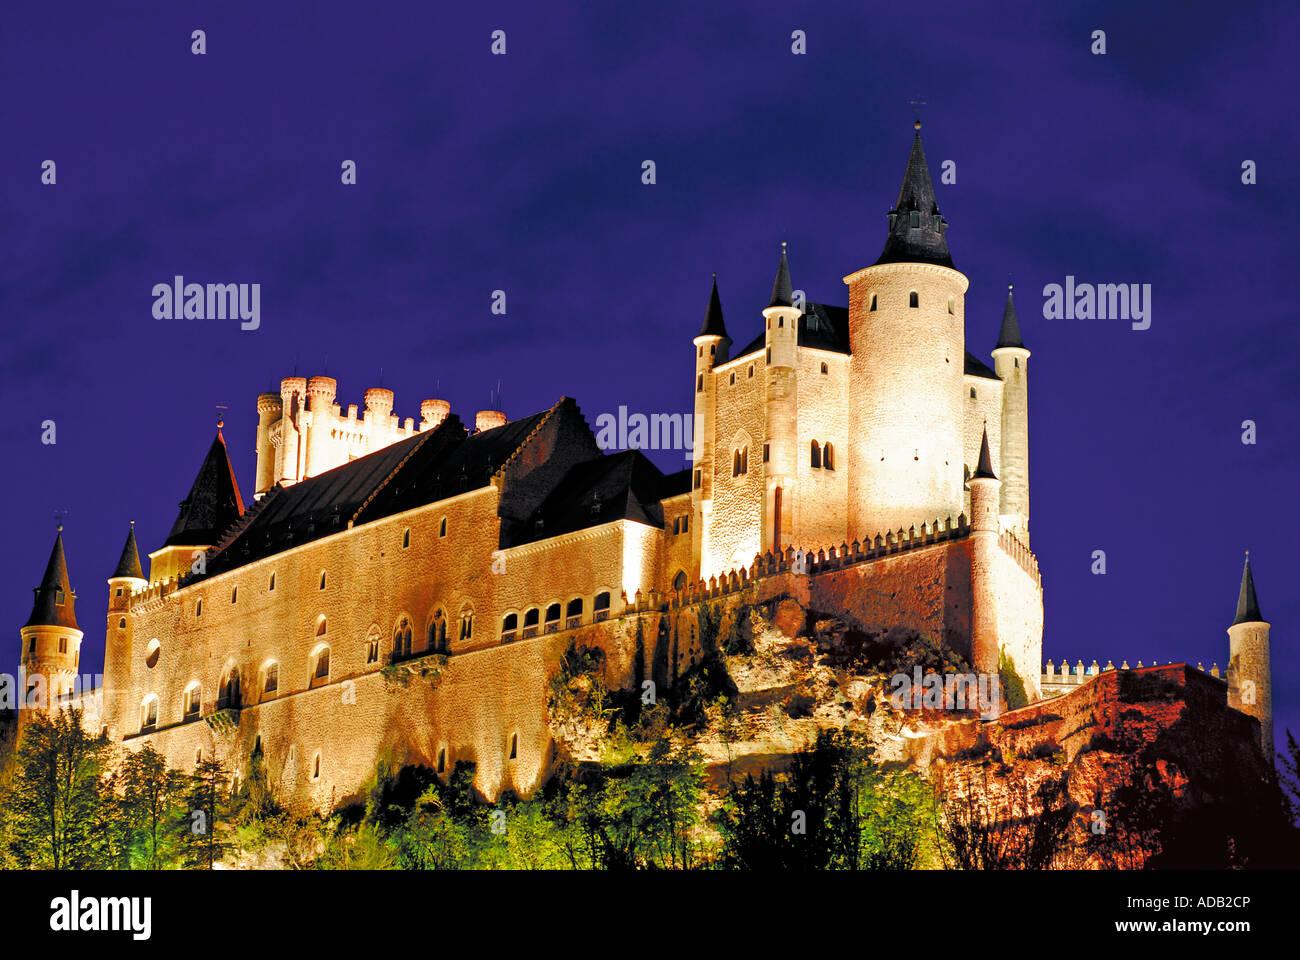 Night view of the Alcazar, Segovia, Castilla-Leon, Spain - Stock Image